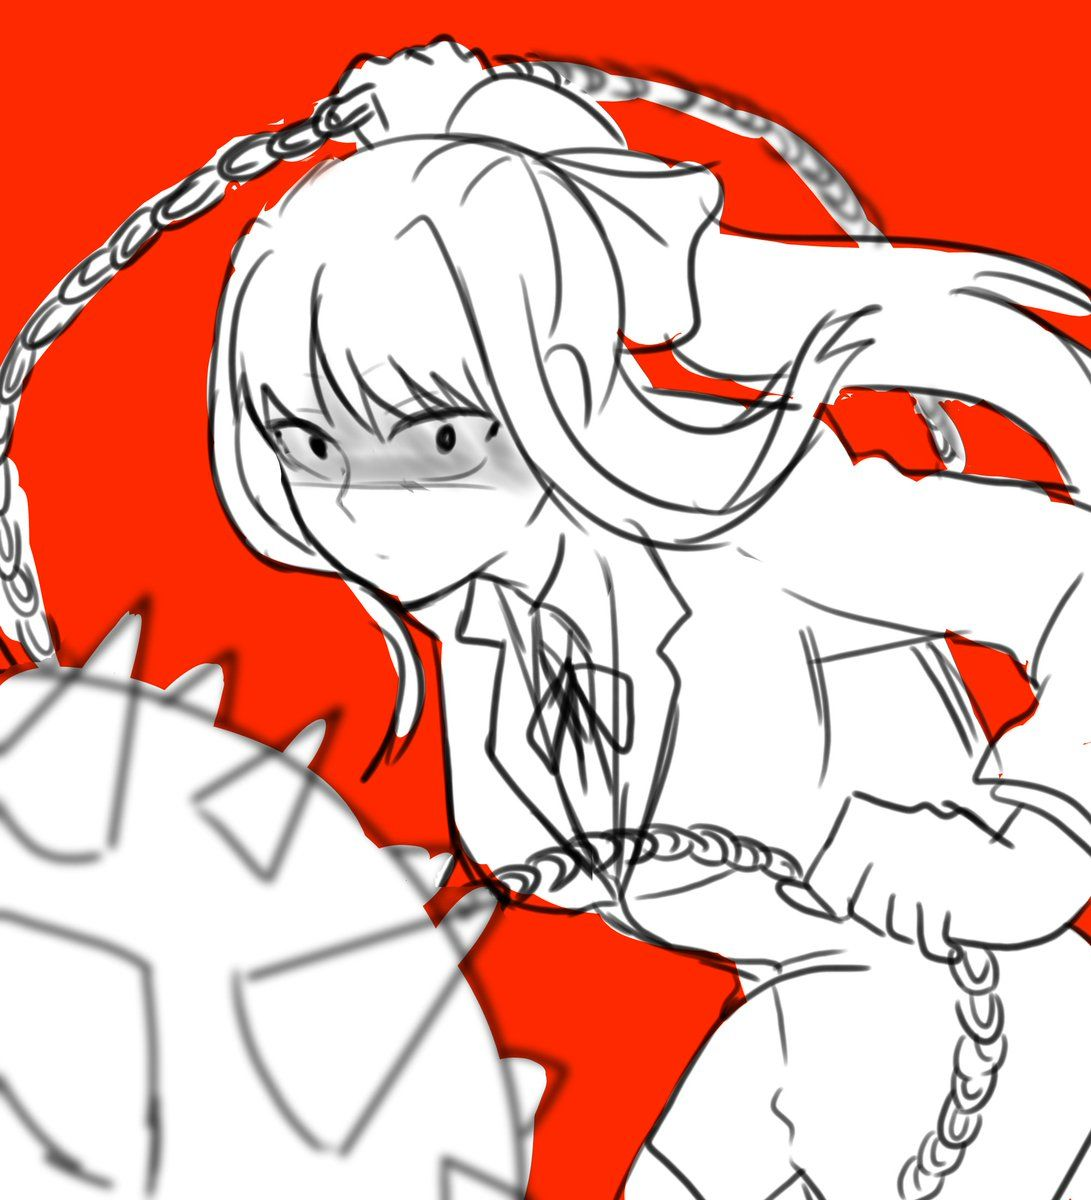 gomi on Doki, Anime